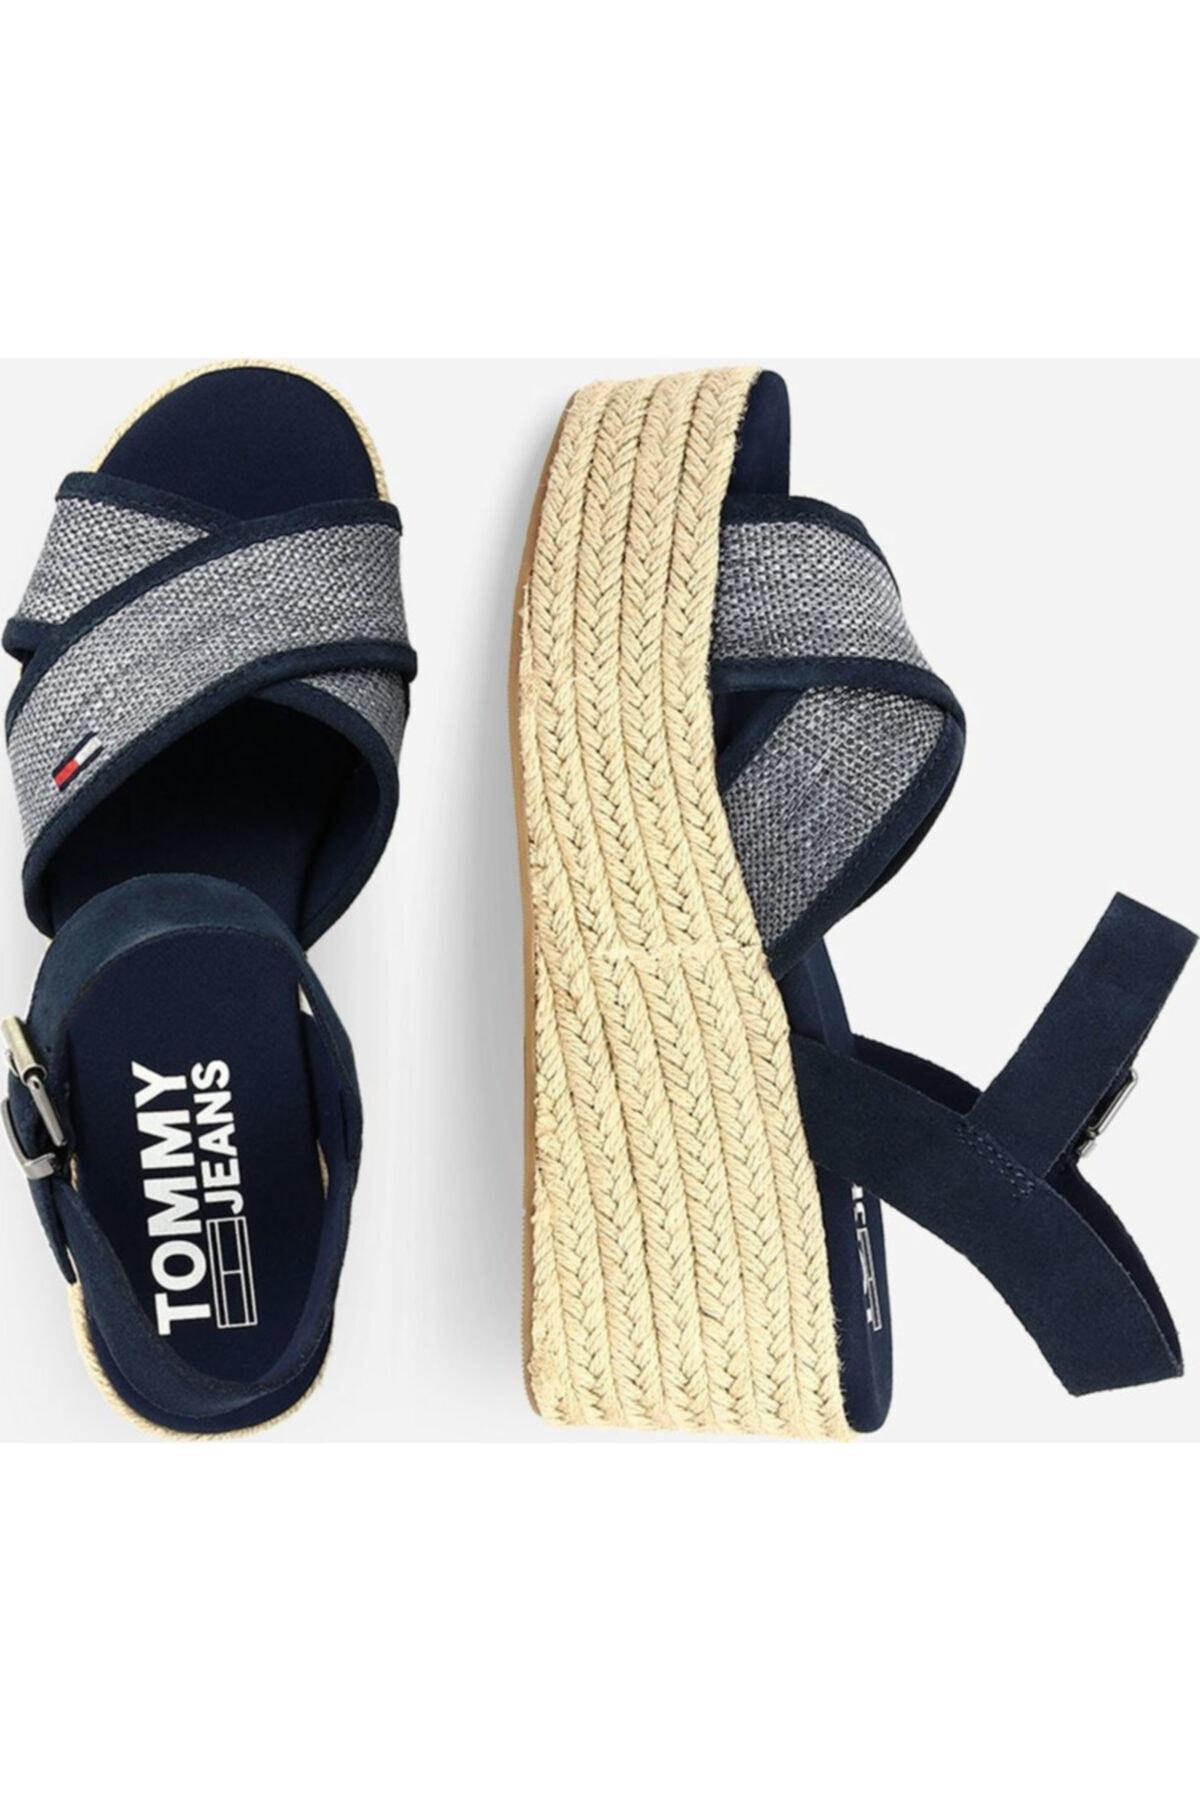 Tommy Hilfiger Kadın Lacivert Dolgu Topuk Sandalet En0en00910-c87 2